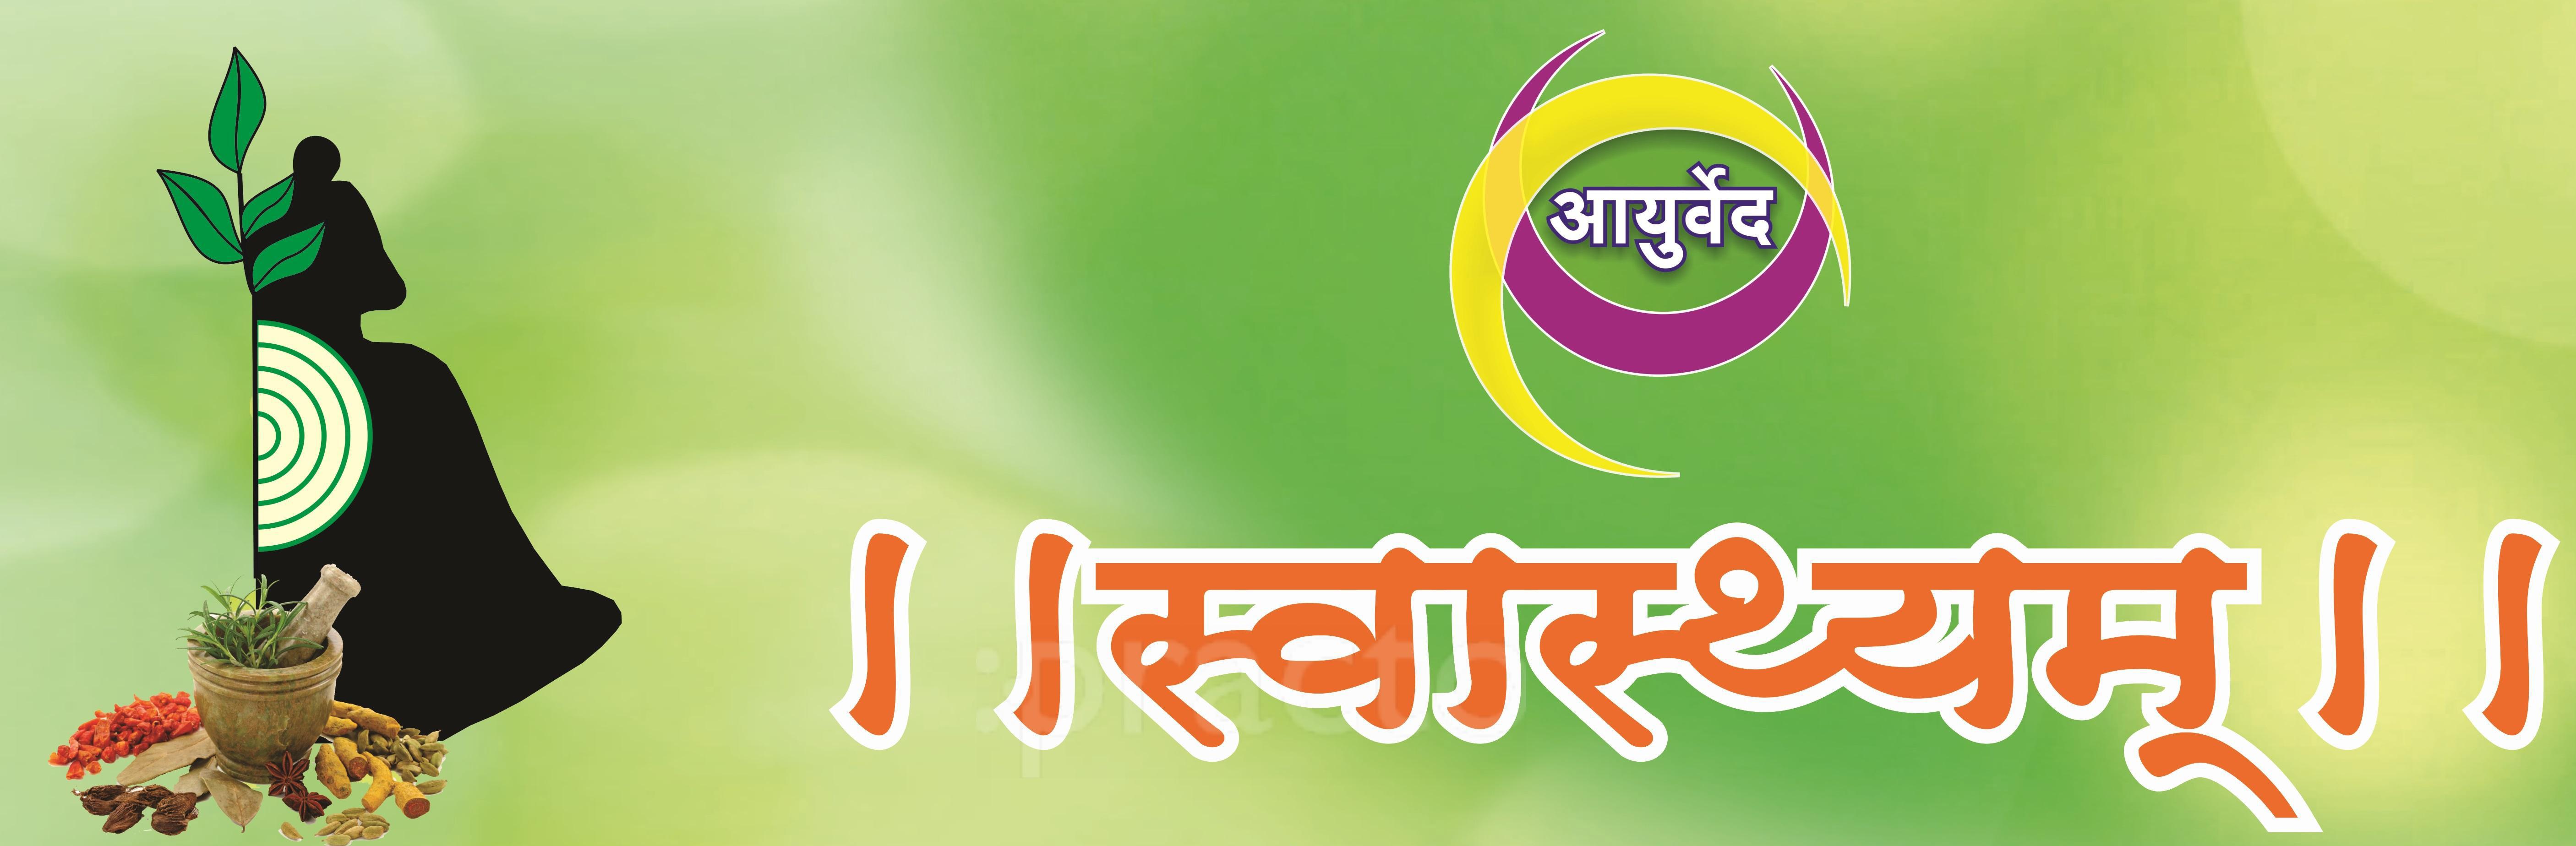 Swasthyam Ayurveda & Panchkarma Super Speciality Hospital